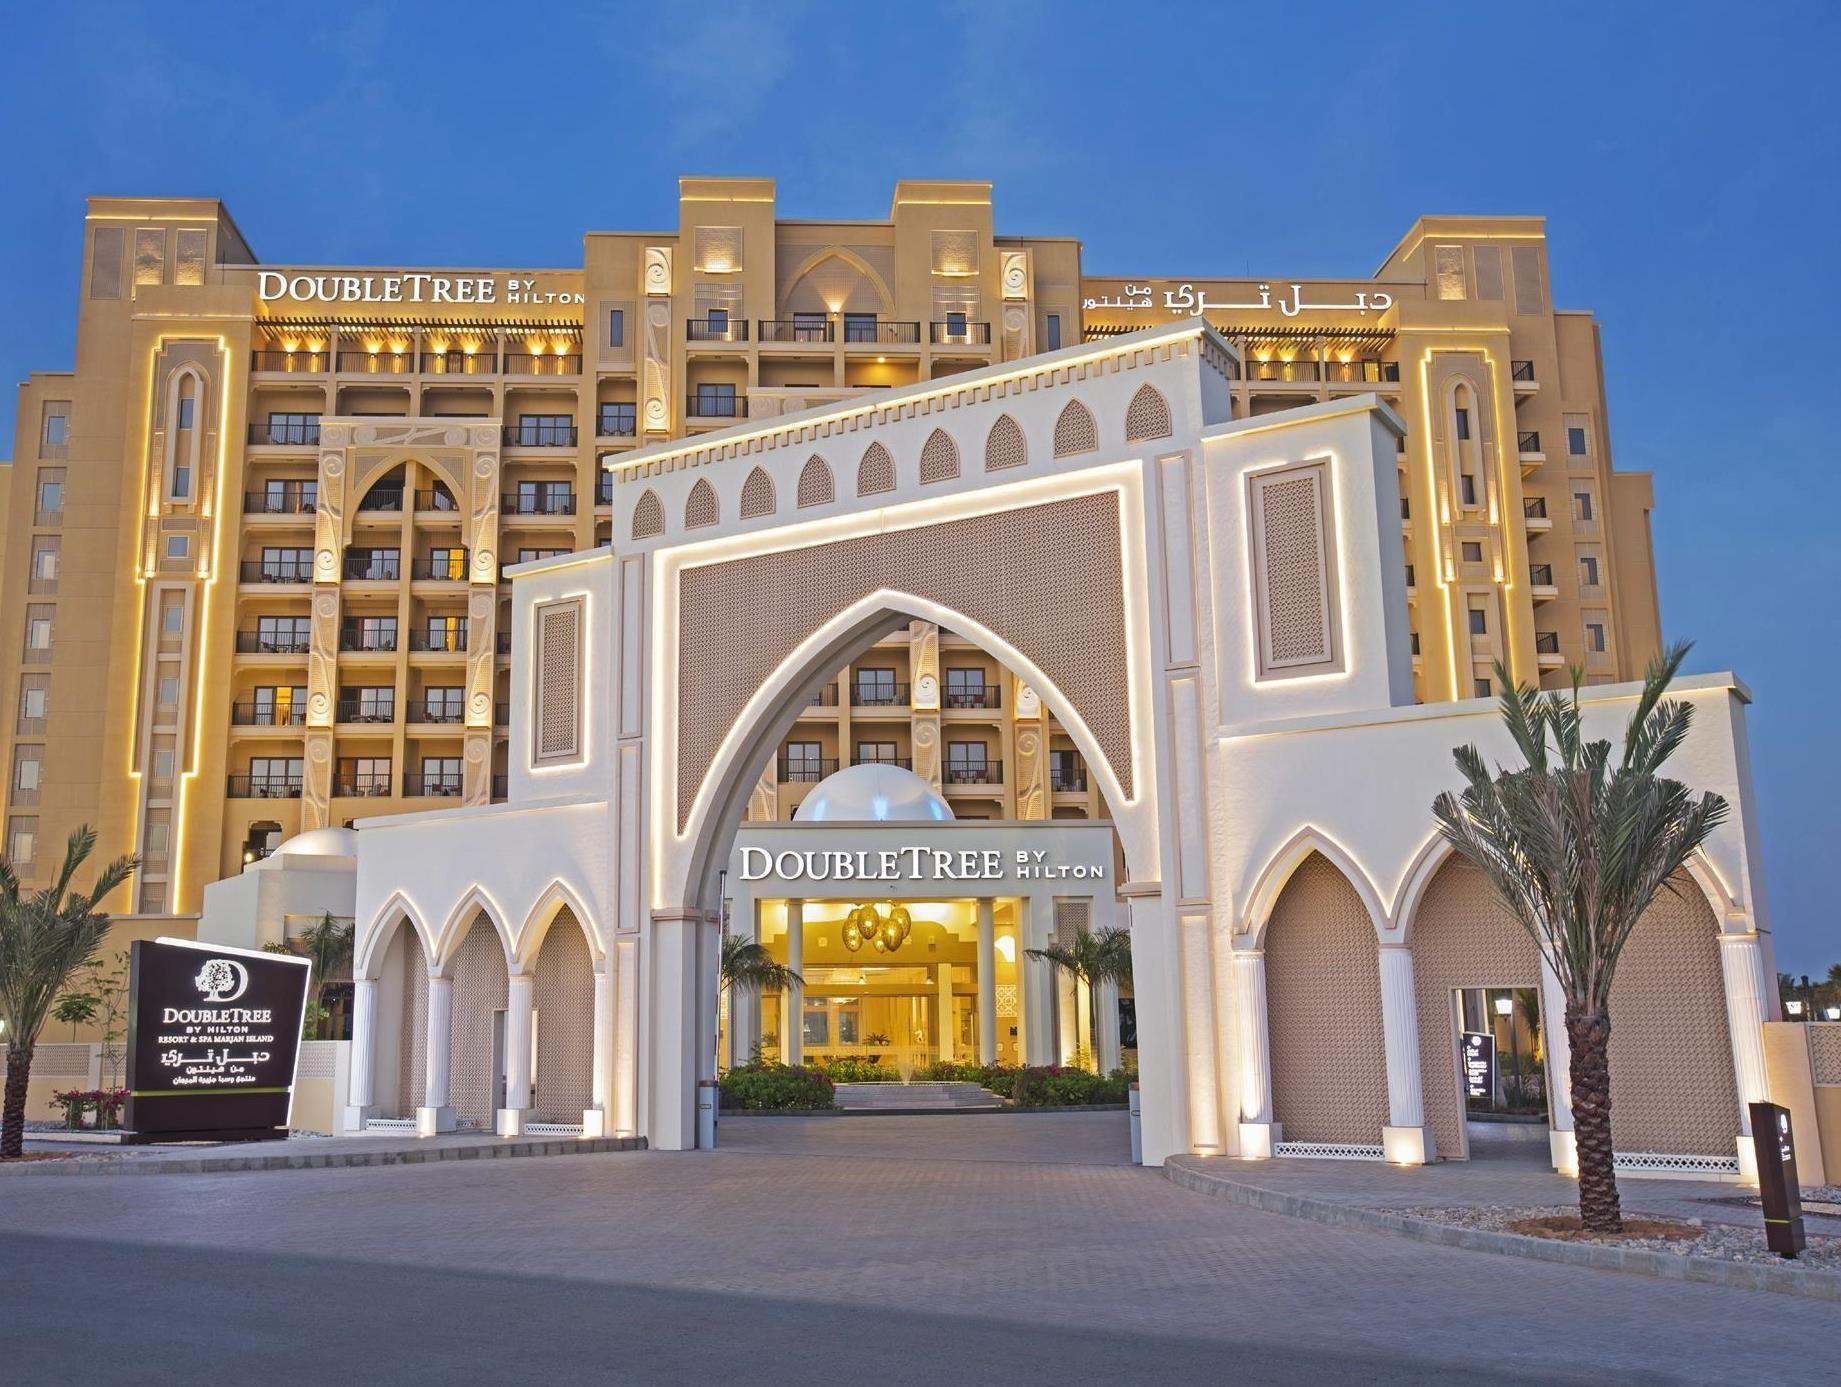 Ras Al Khaimah Doubletree By Hilton Hotel Resort And Spa Marjan Island United Arab Emirates Middle East Doubletree By Hilton Hilton Hotel Hotel Ras Al Khaimah